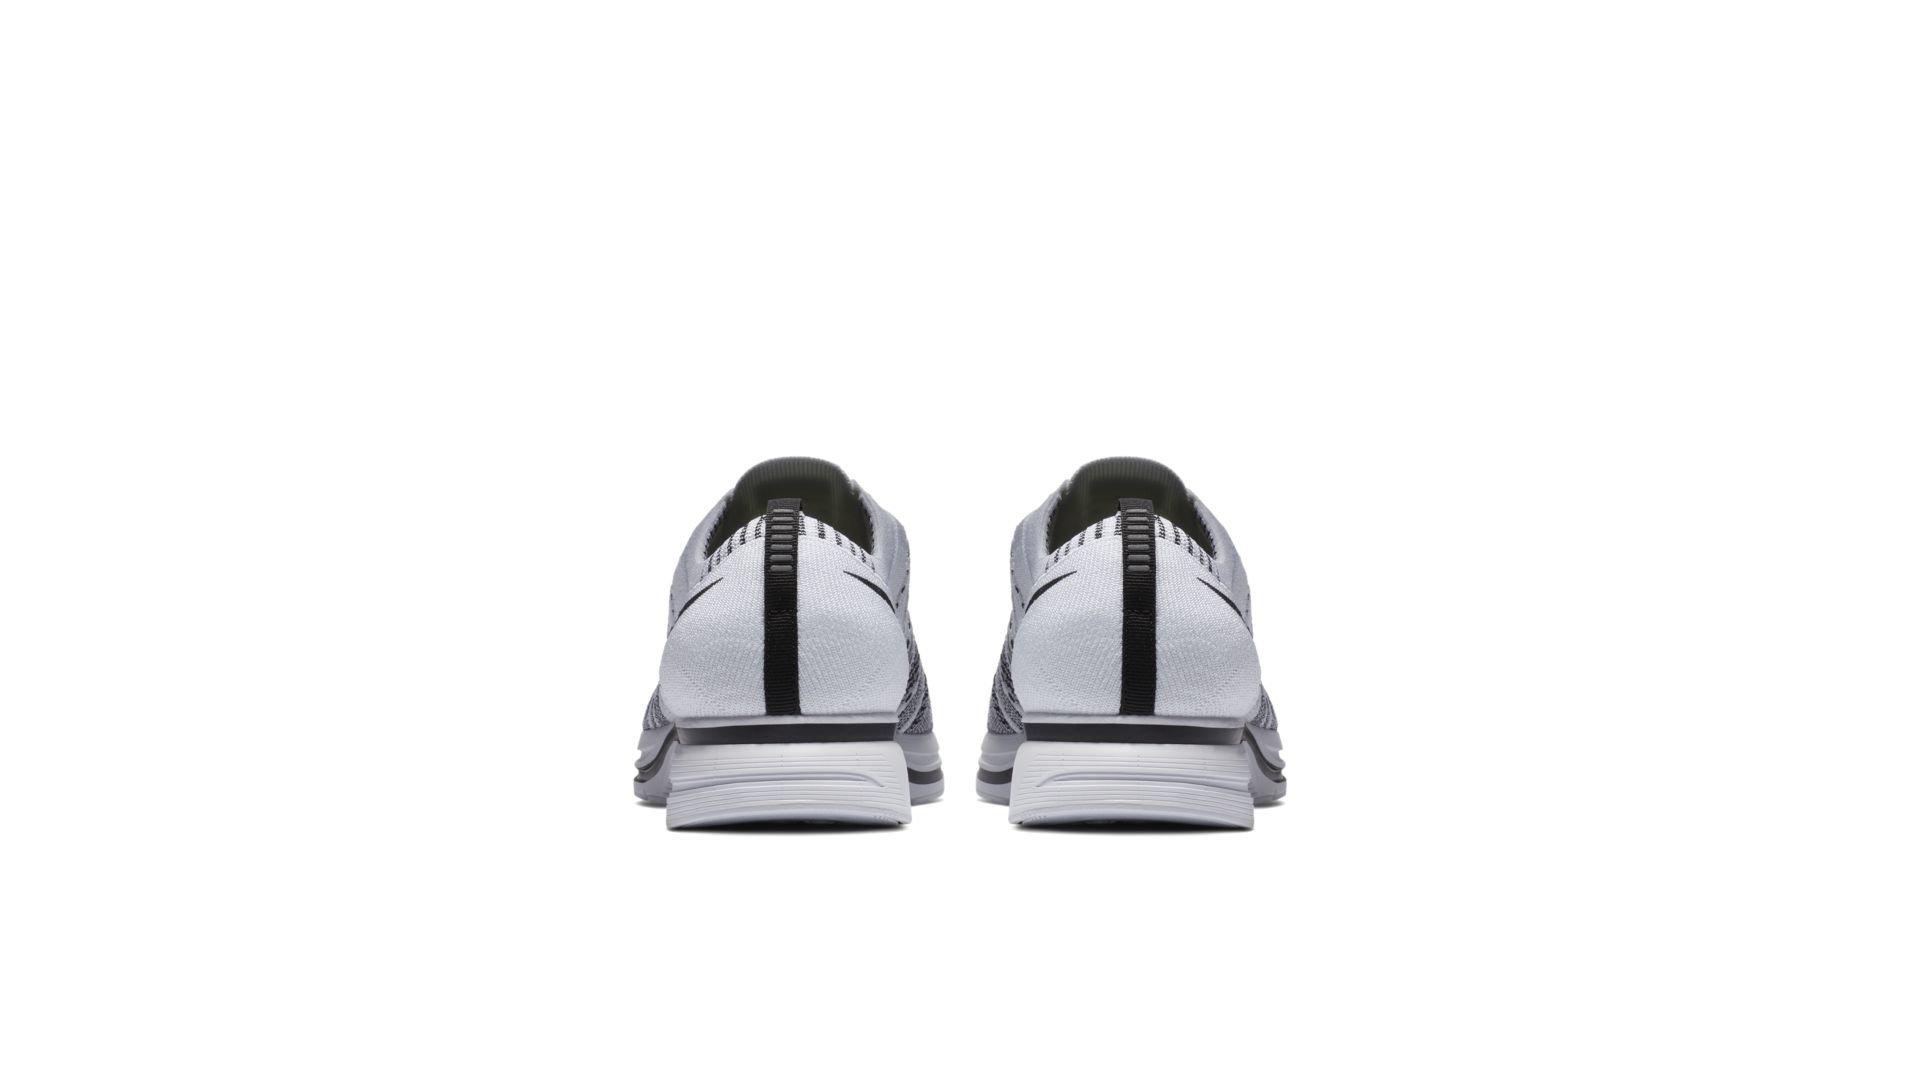 Nike Flyknit Trainer White Black (2017) (AH8396-100)